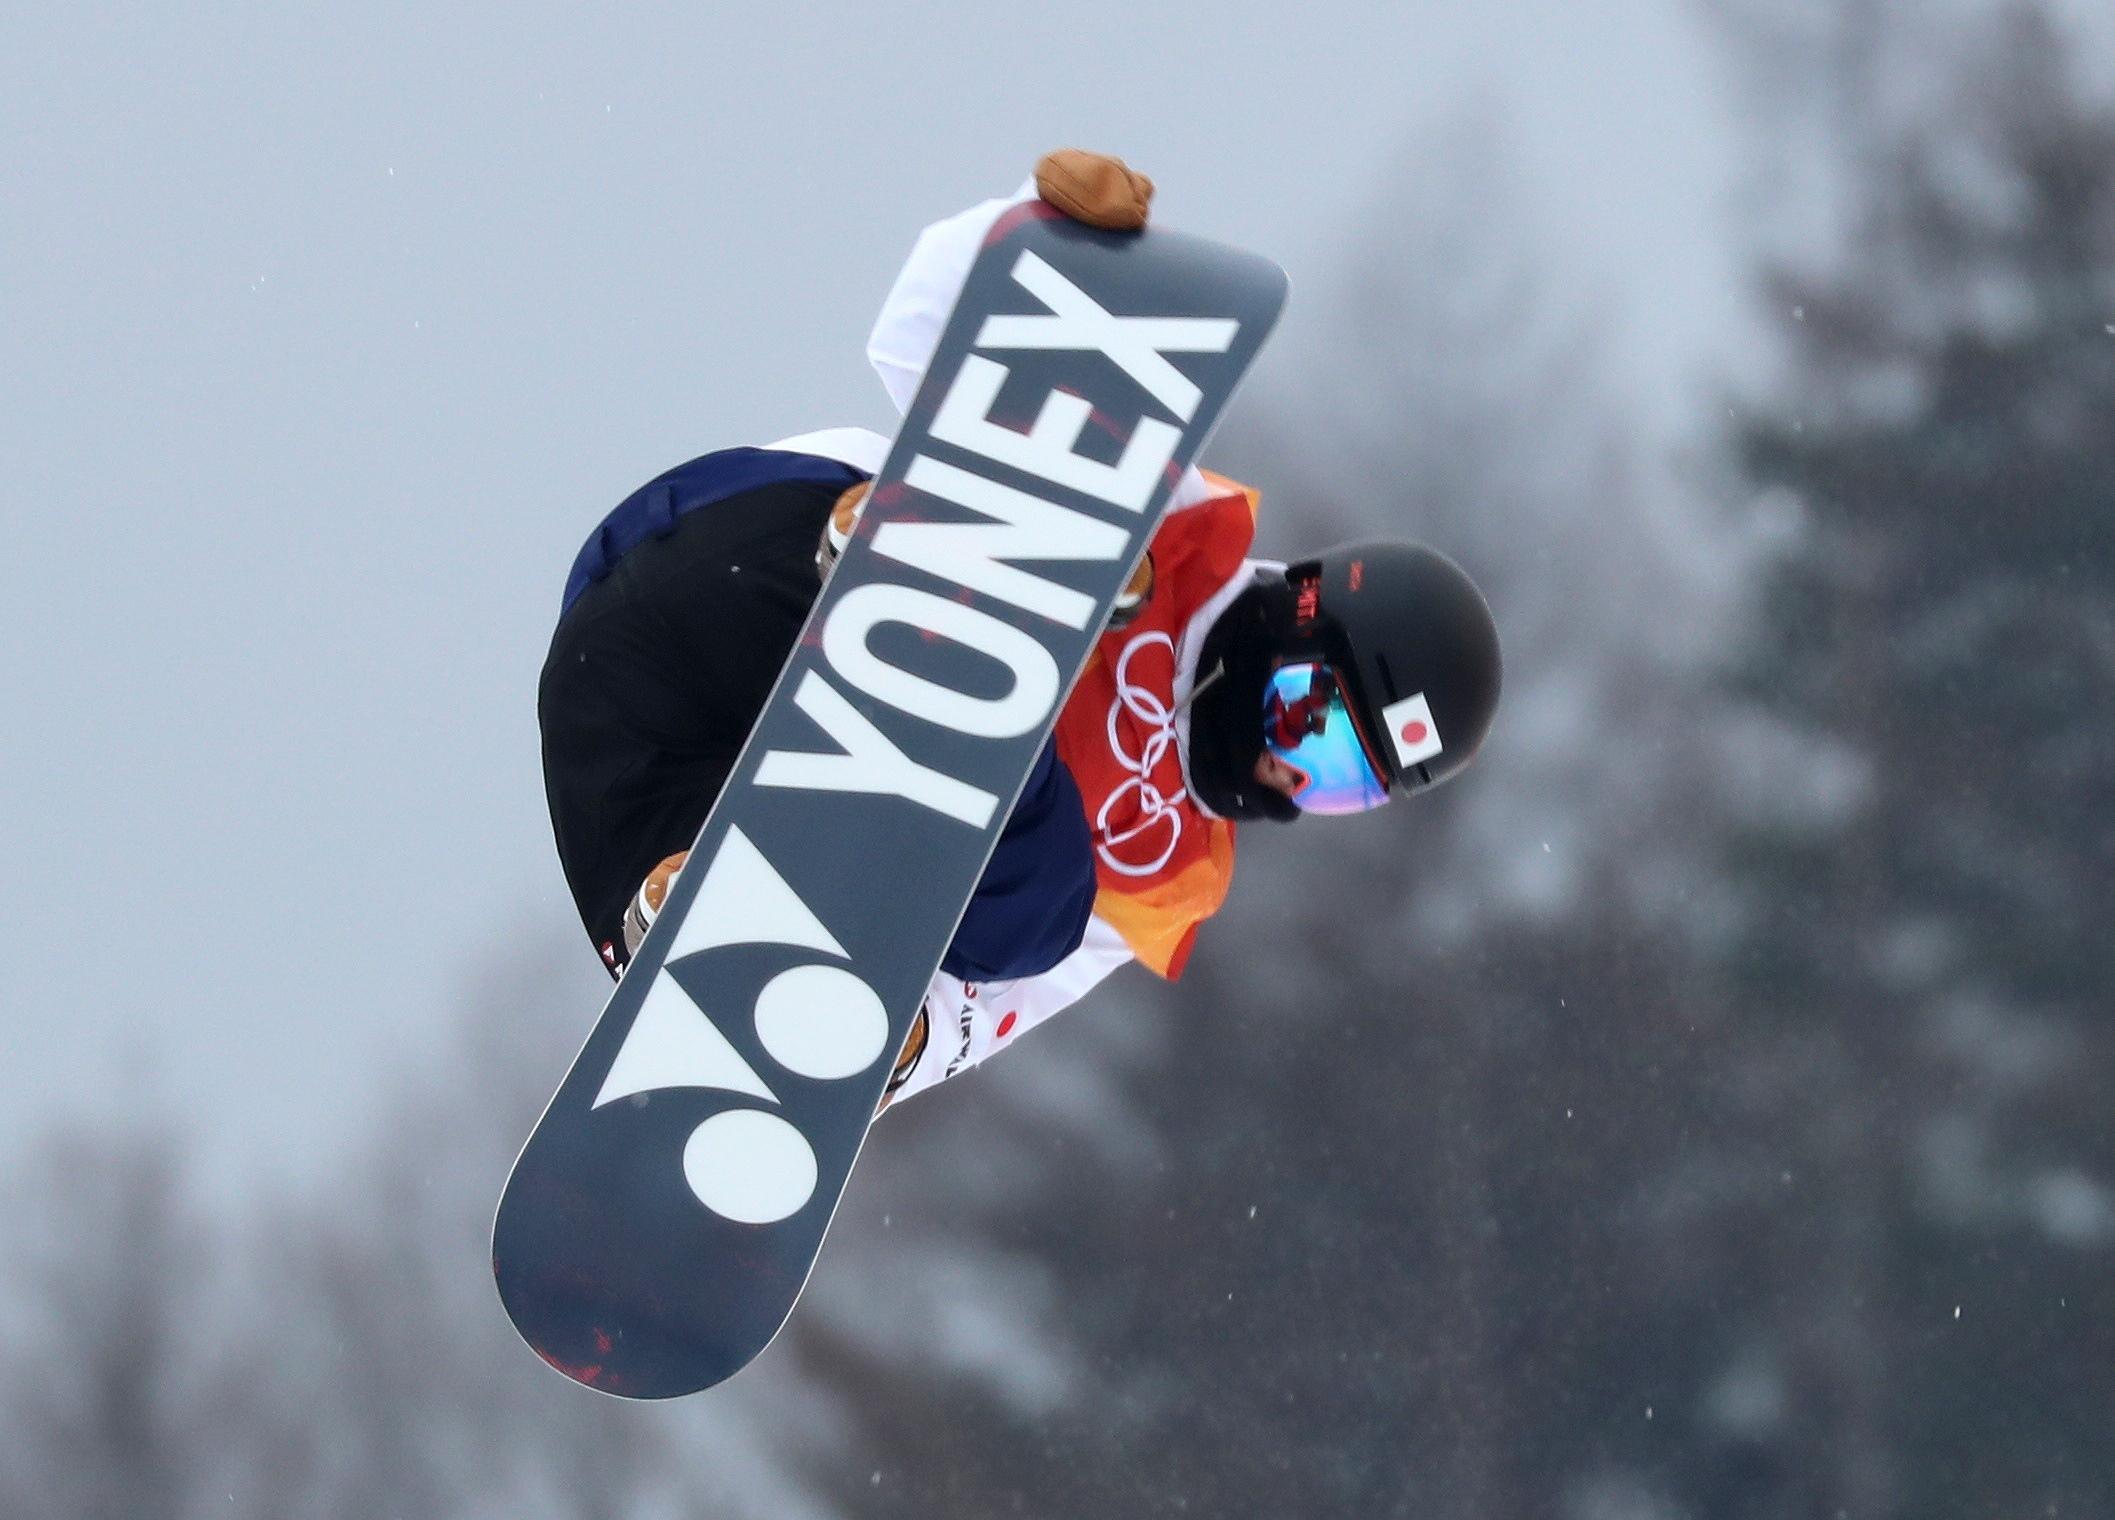 Snowboarding - Pyeongchang 2018 Winter Olympics - Men's Halfpipe Finals - Phoenix Snow Park – Pyeongchang, South Korea – February 14, 2018 - Yuto Totsuka of Japan competes. REUTERS/Mike Blake